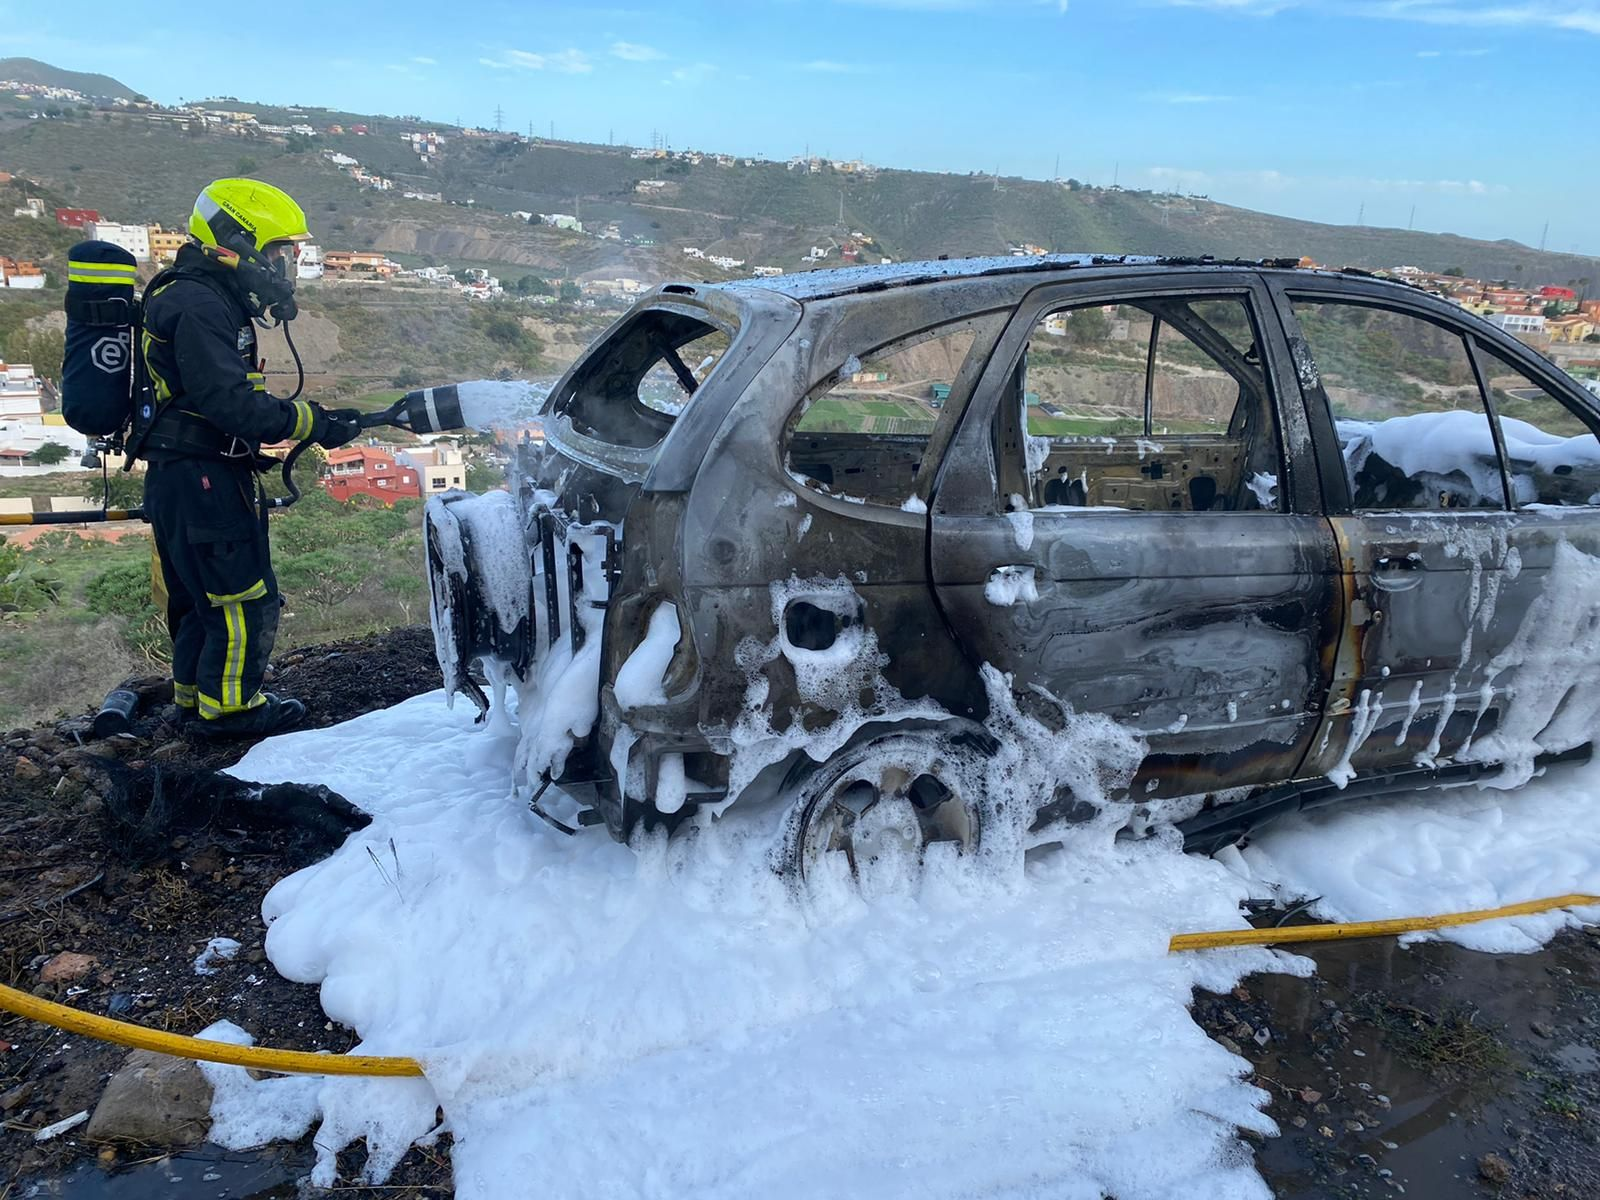 Arde un coche en Telde